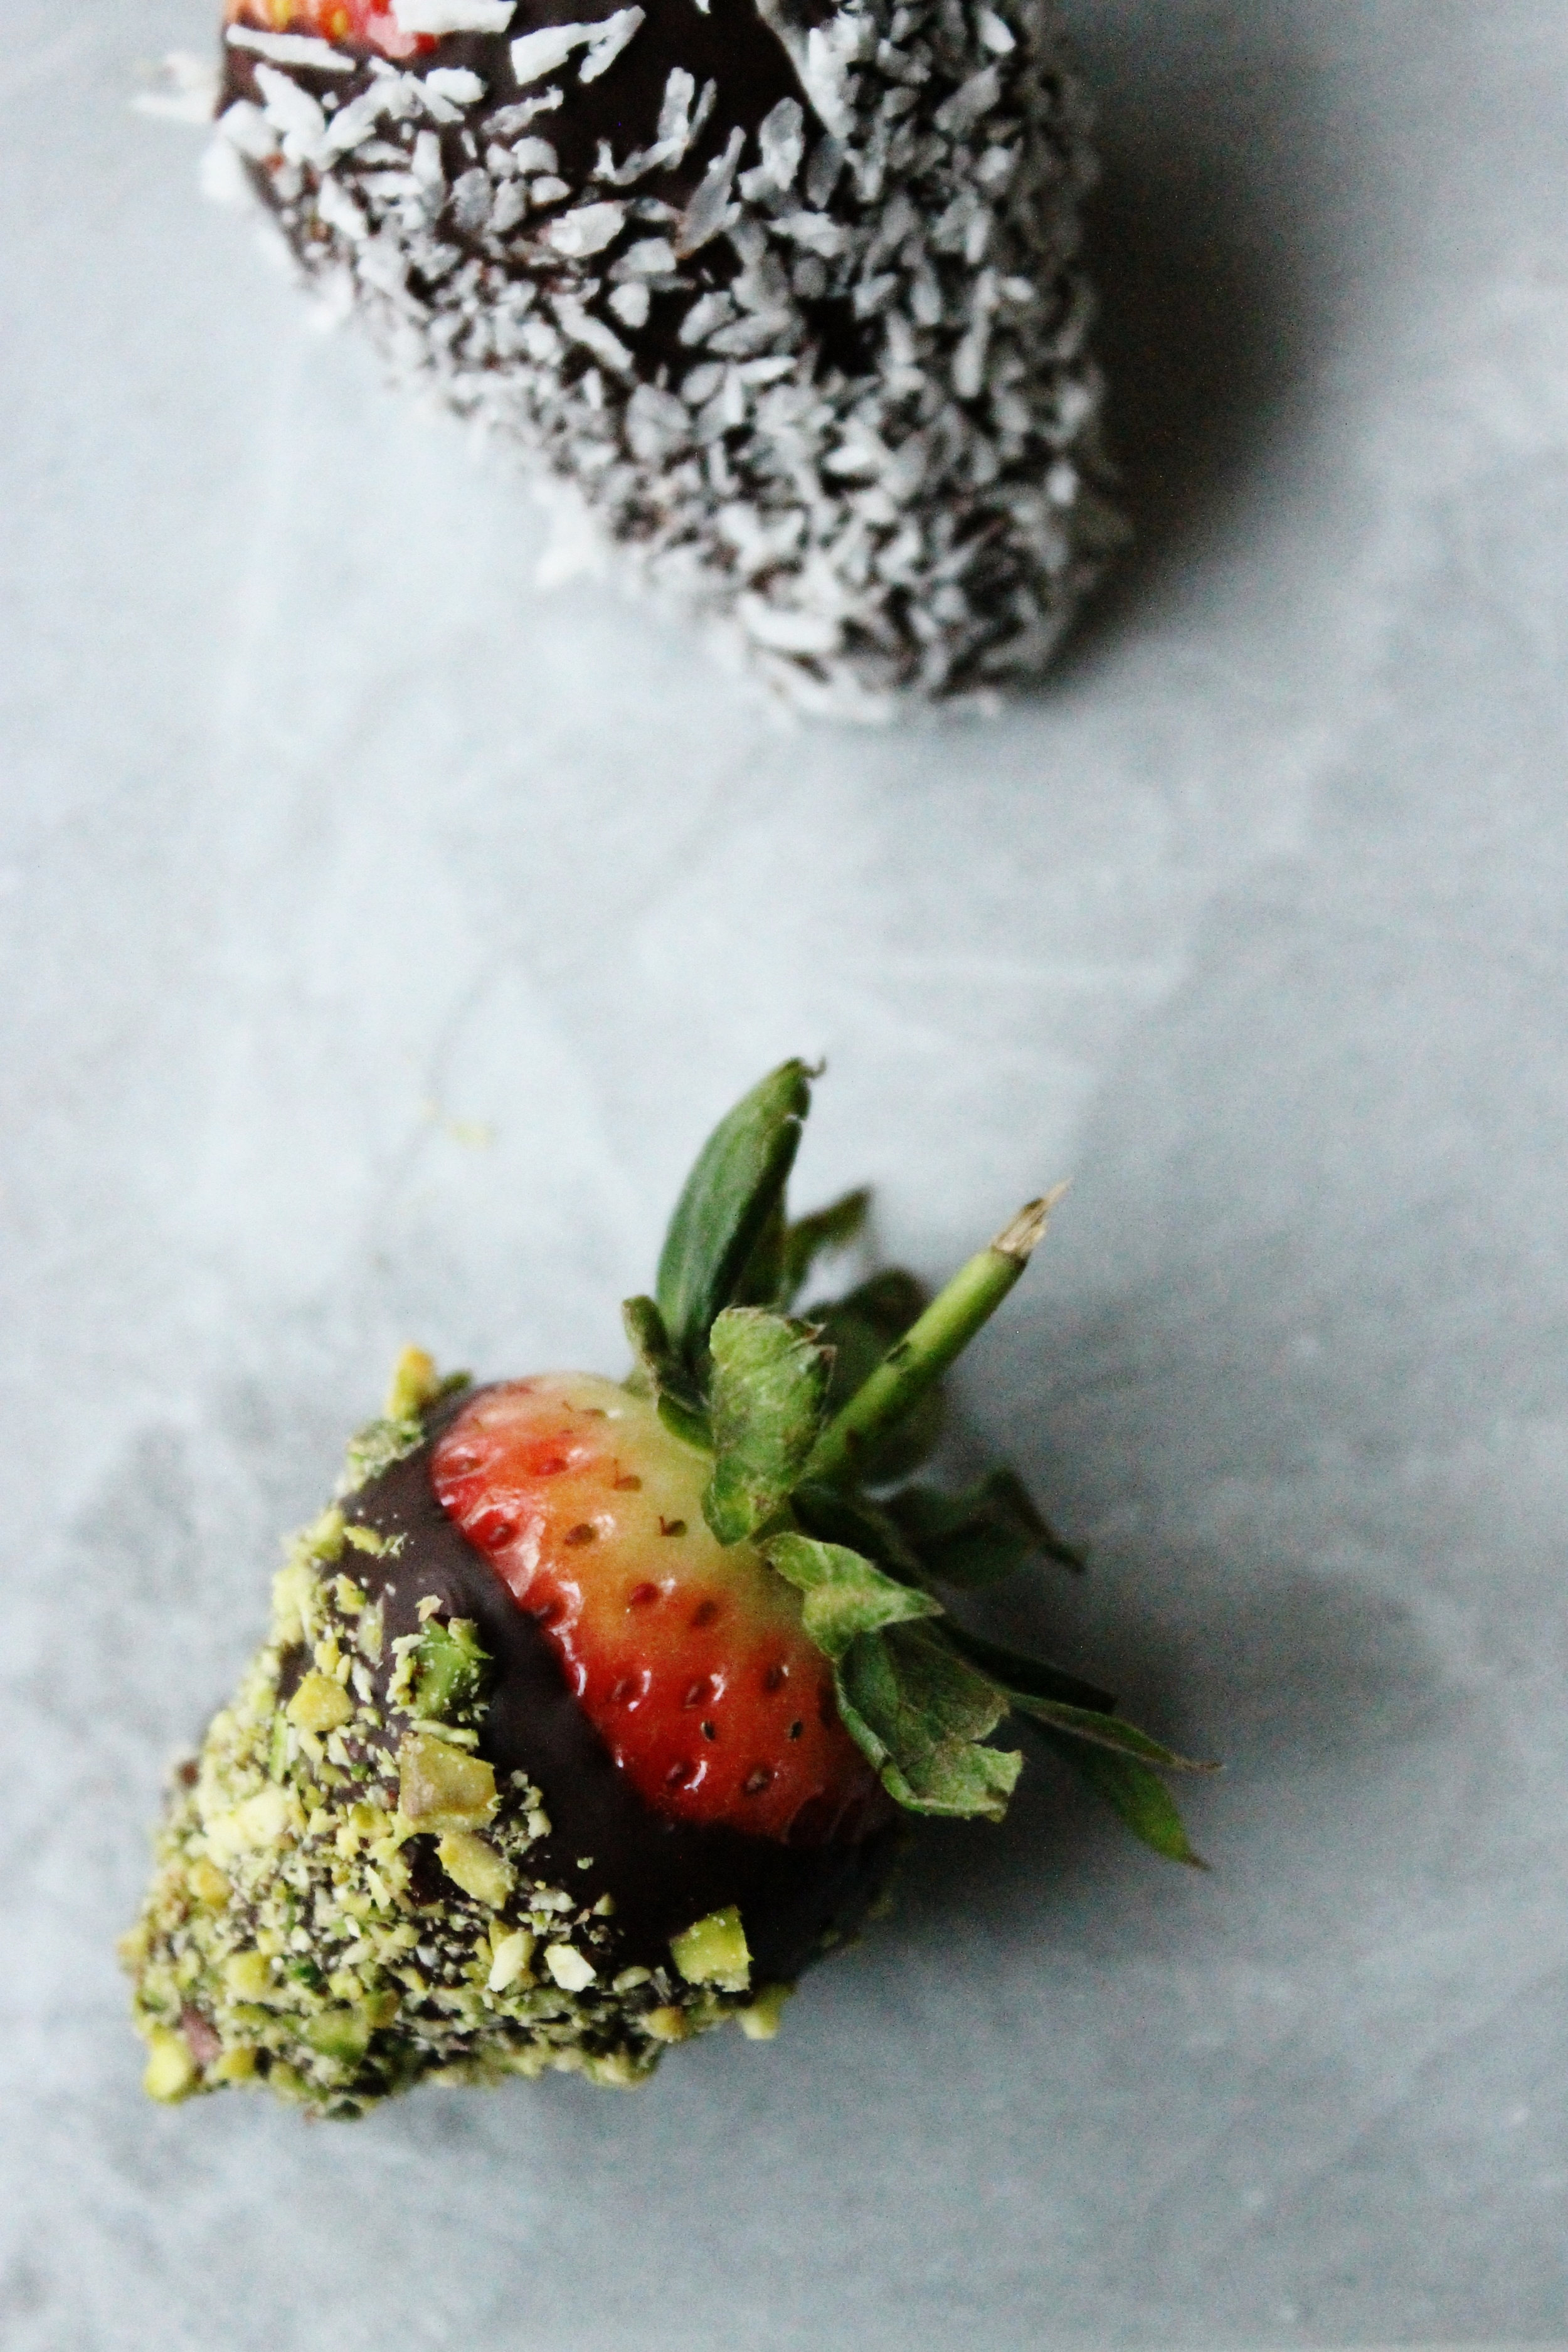 Chocolate covered strawberries | Beloved Kitchen